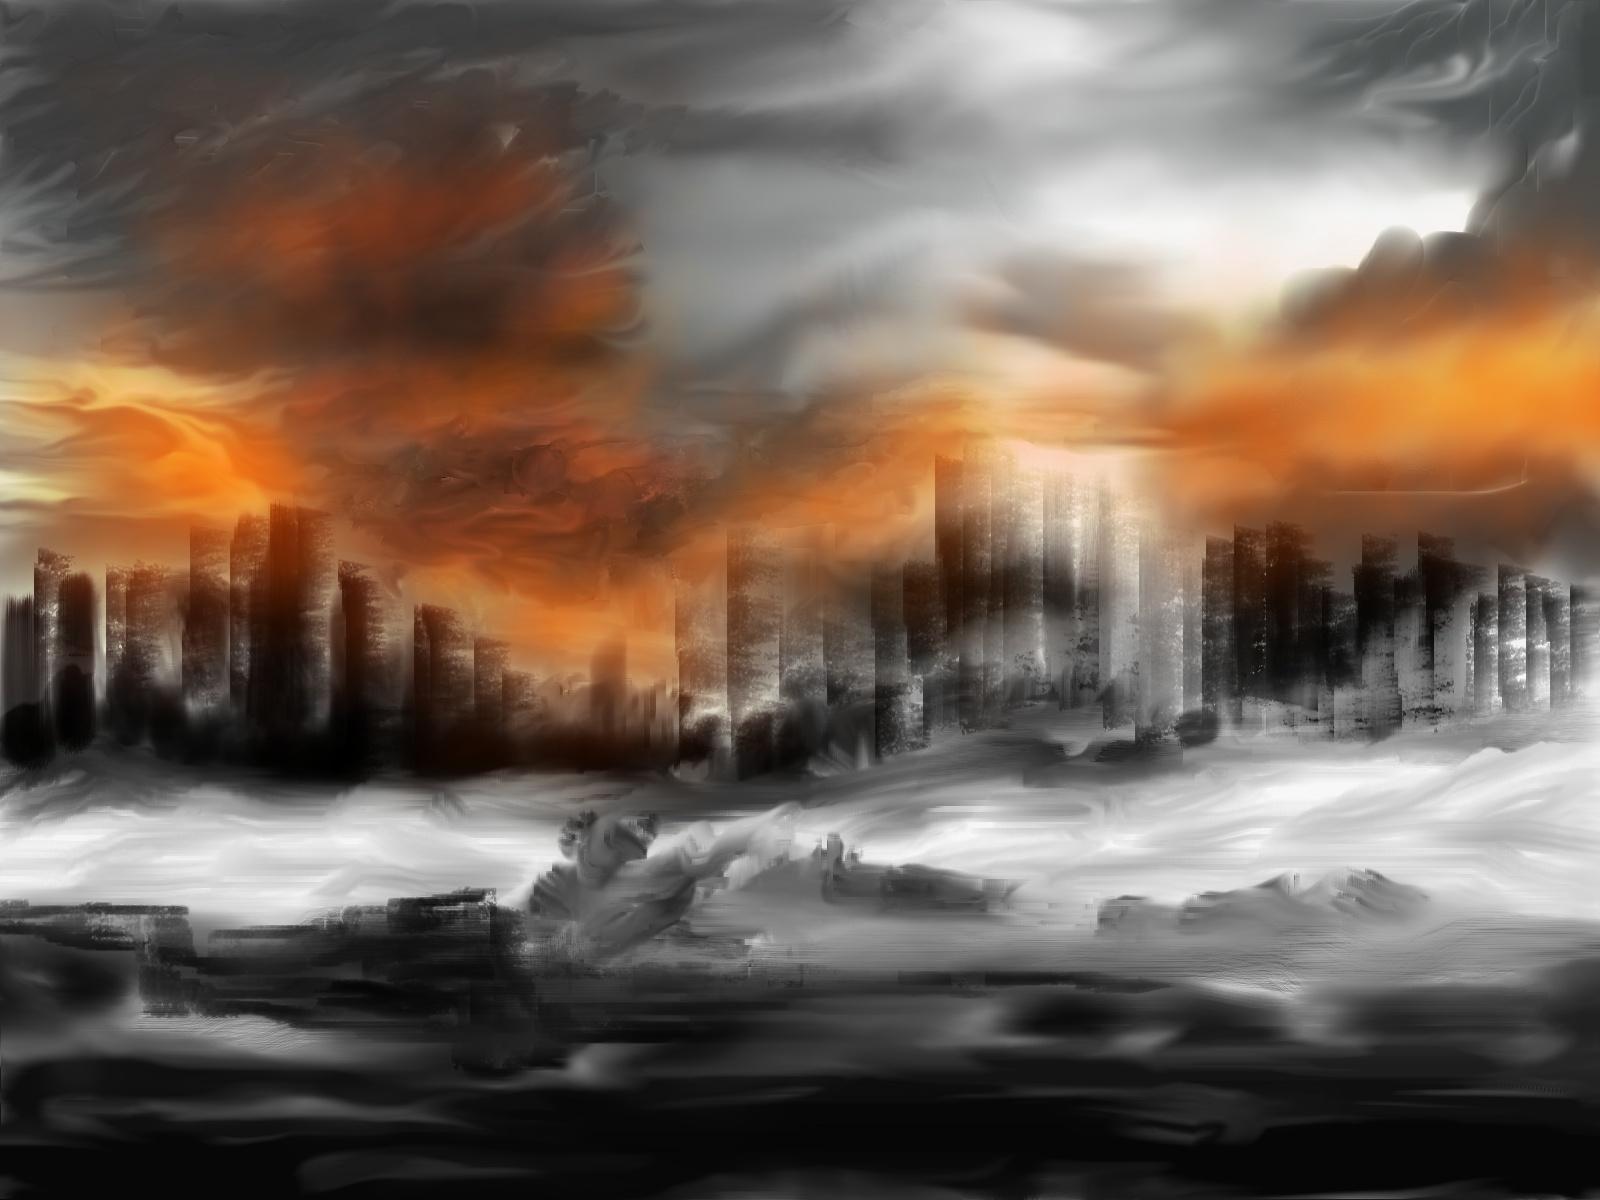 Sci Fi - Apocalyptic Armageddon Wallpaper